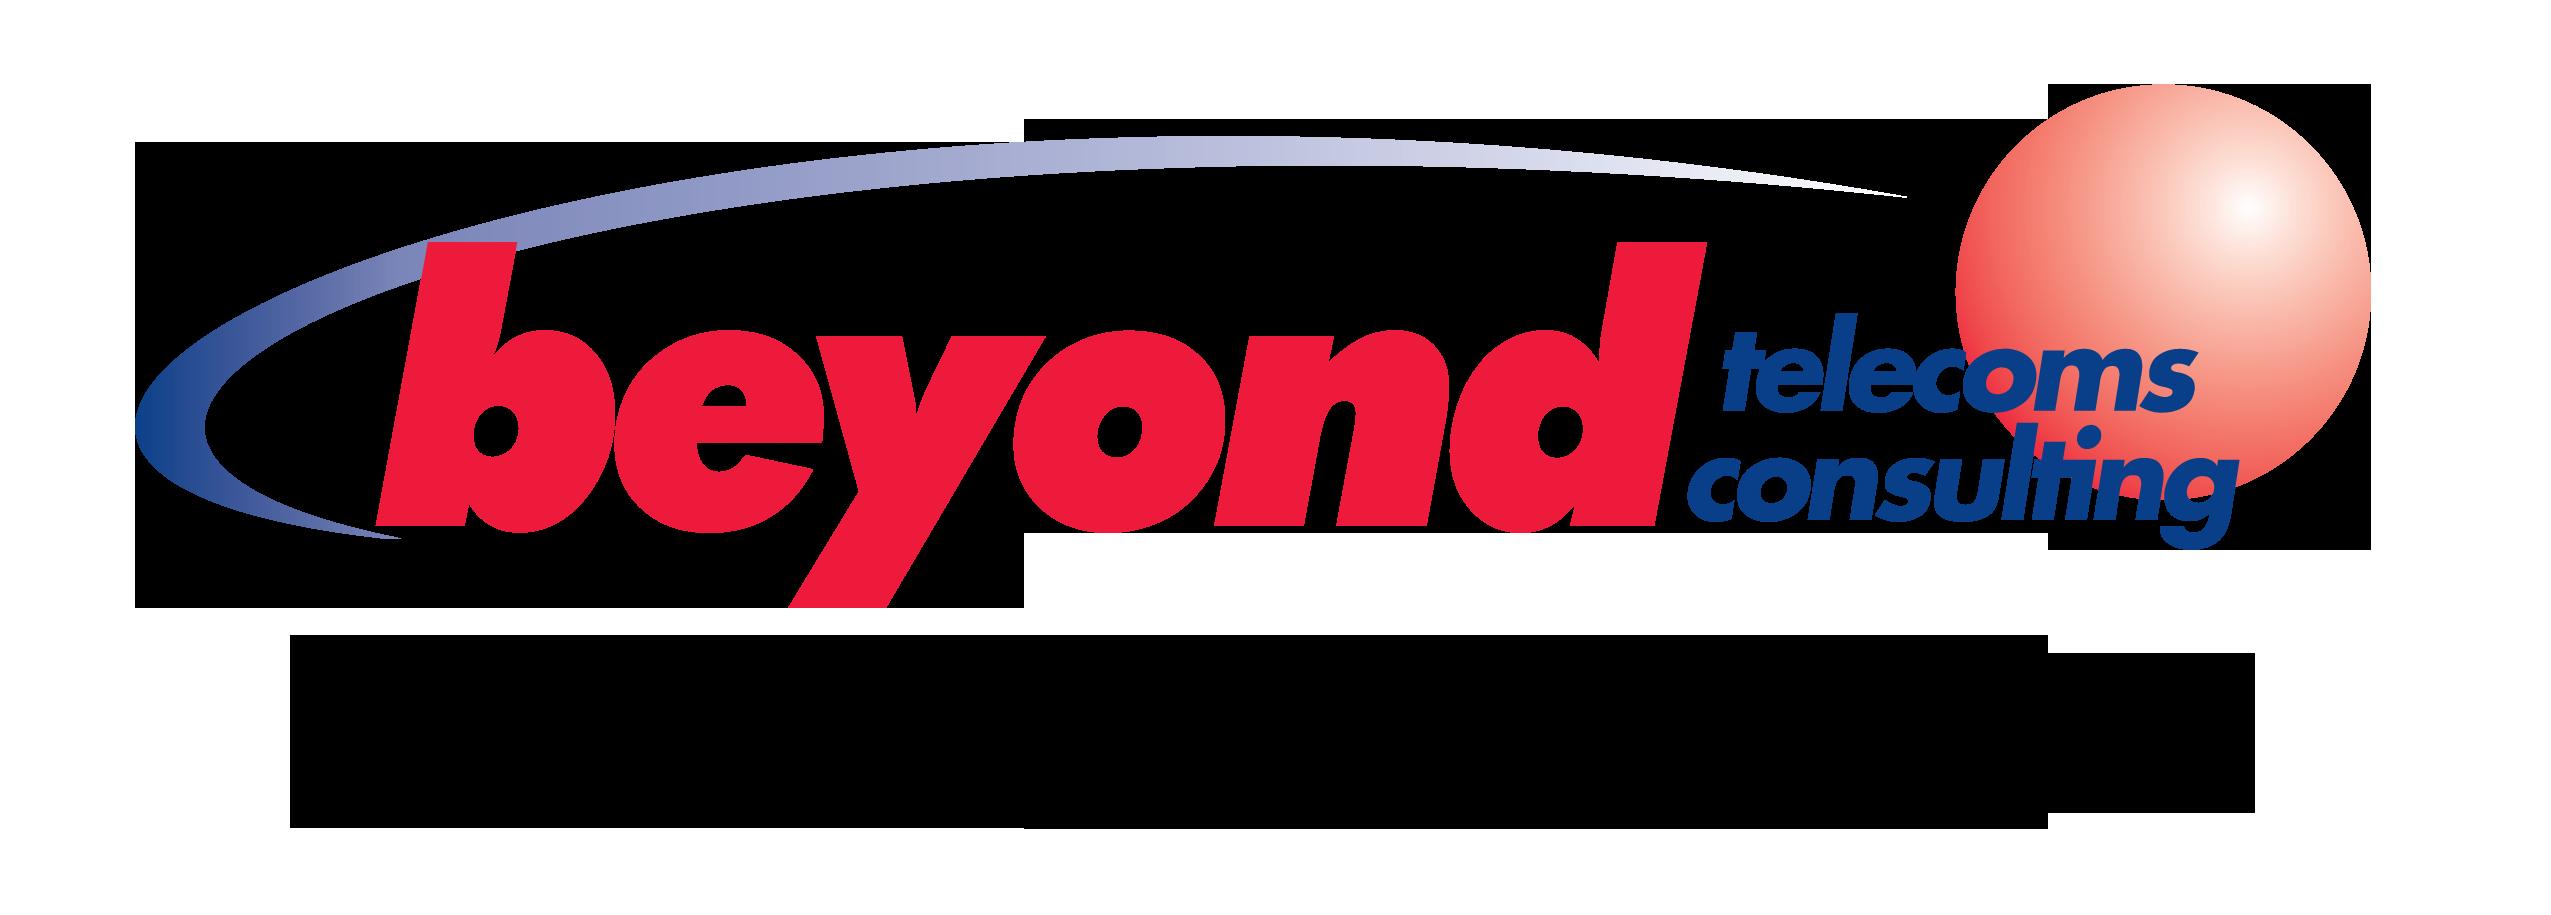 Beyond Telecoms